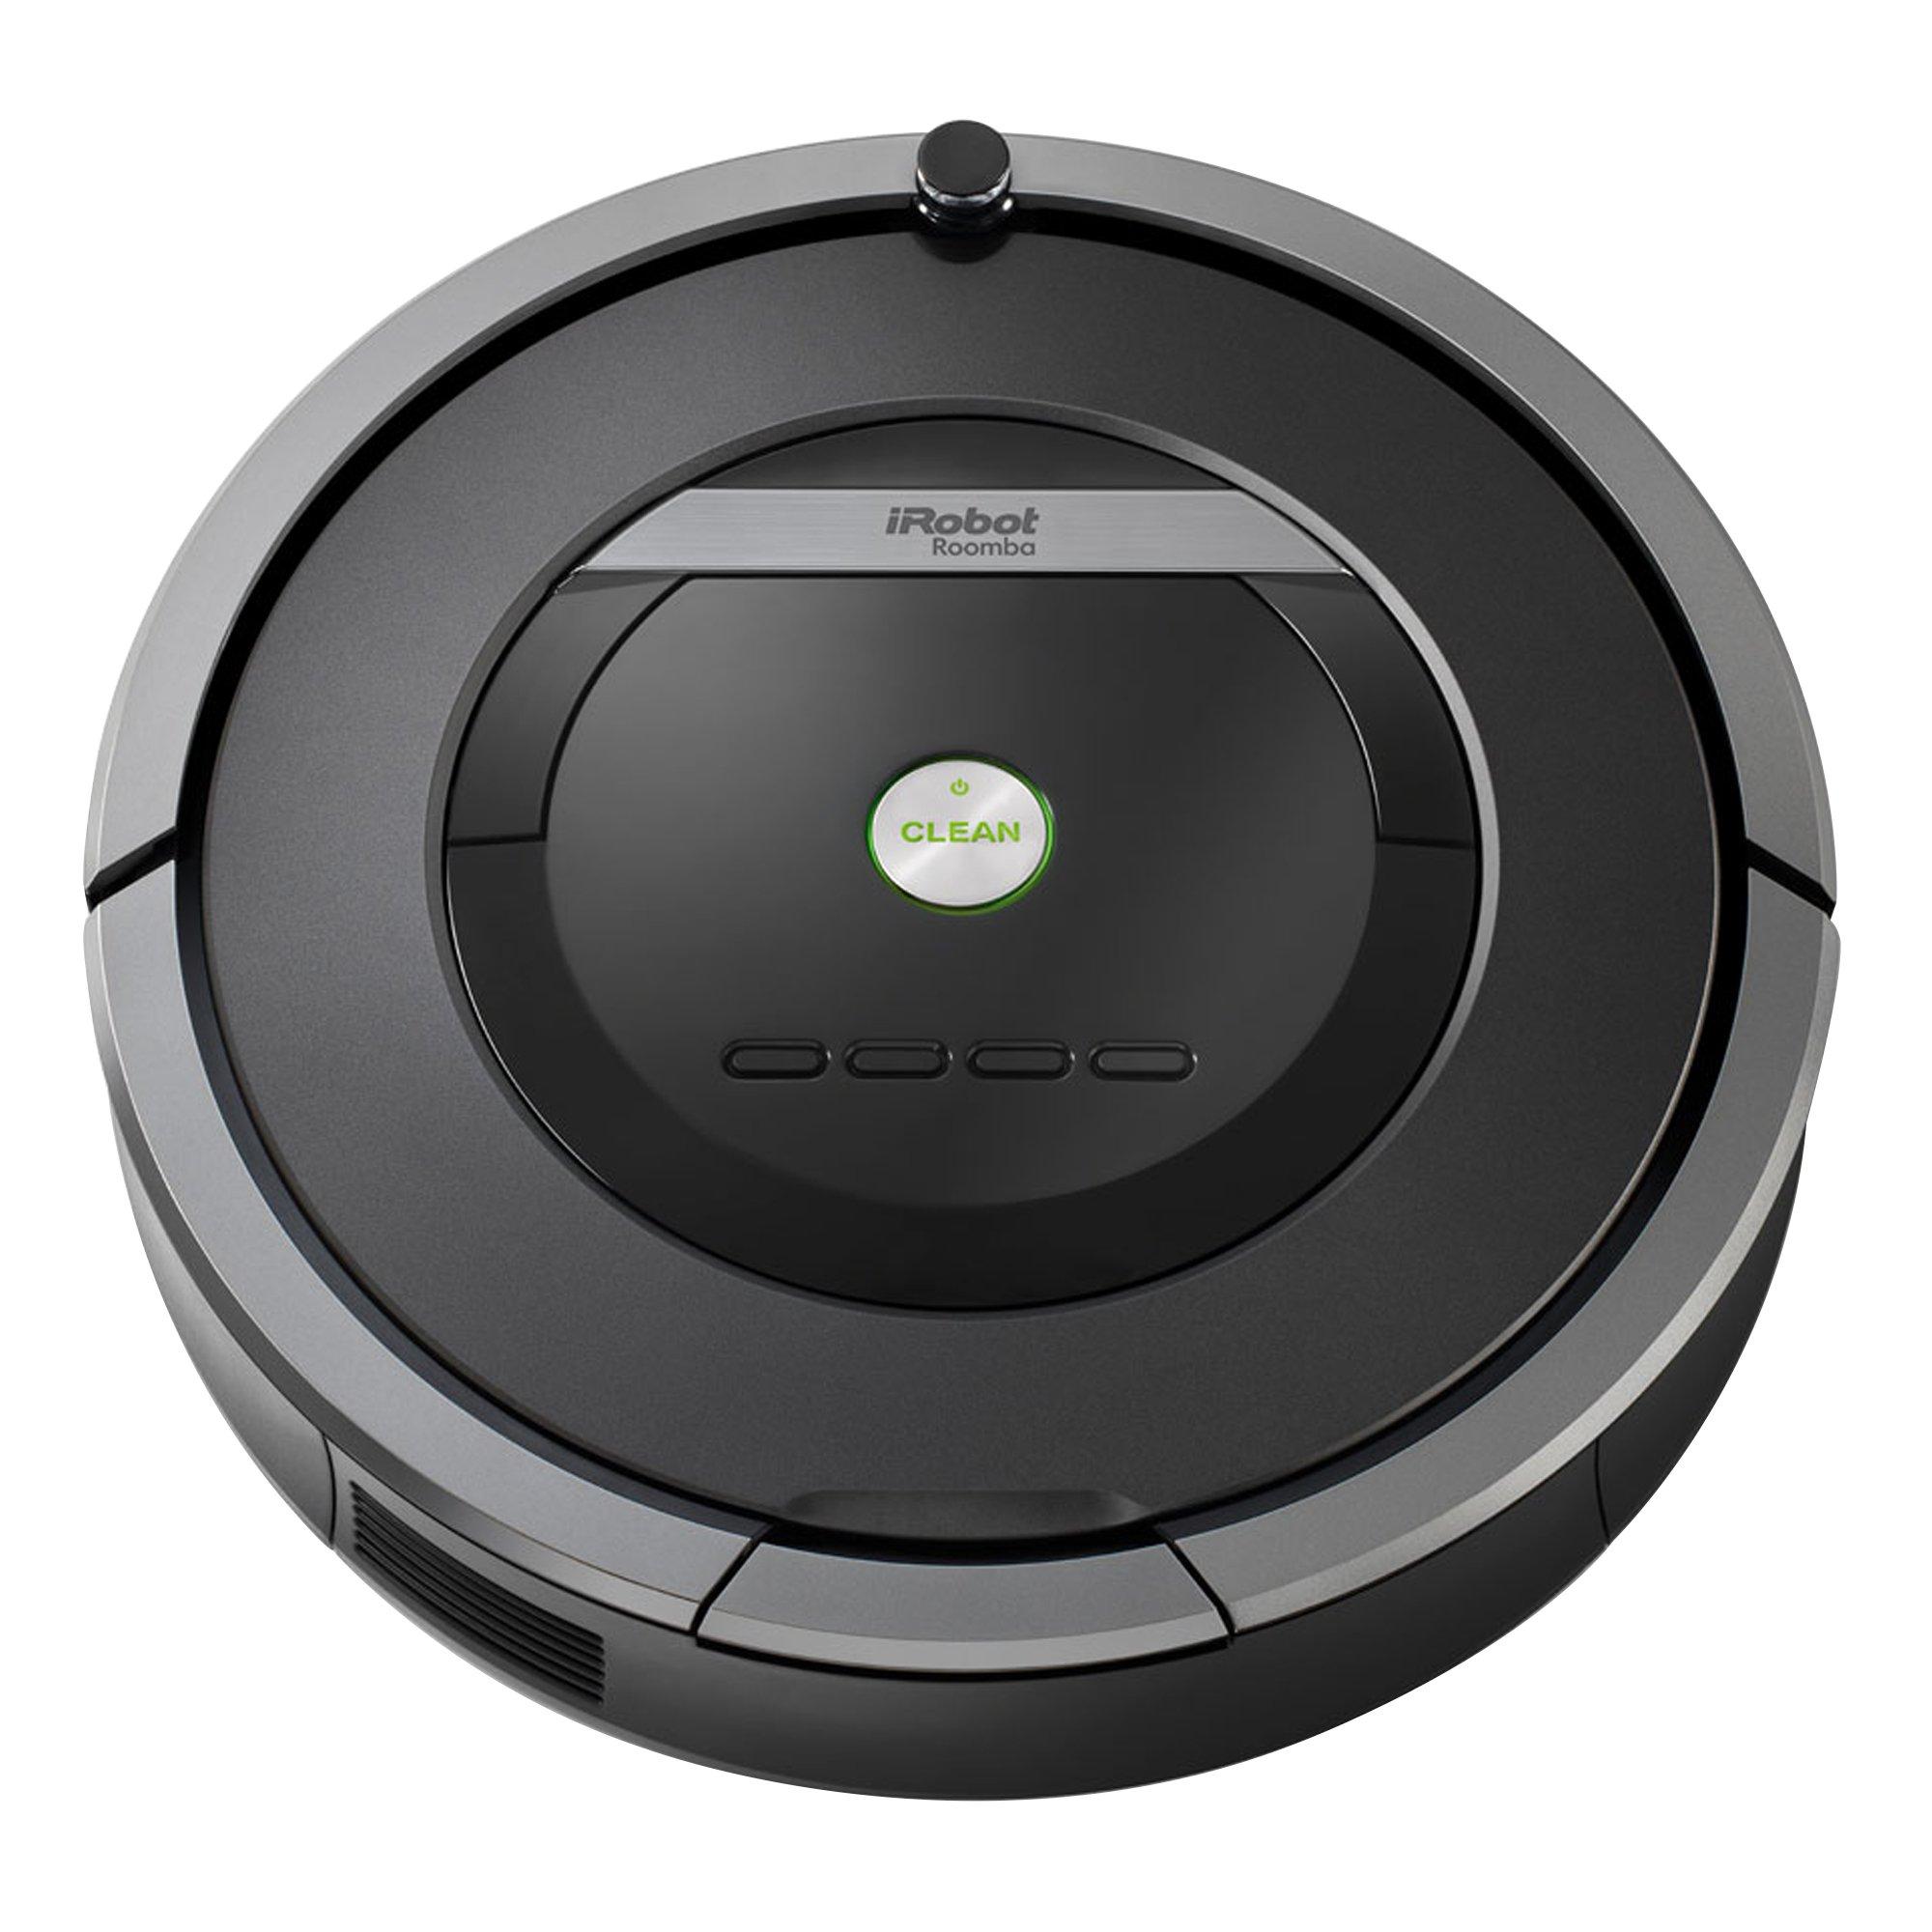 iRobot Roomba 870 Robotic Vacuum Cleaner by iRobot